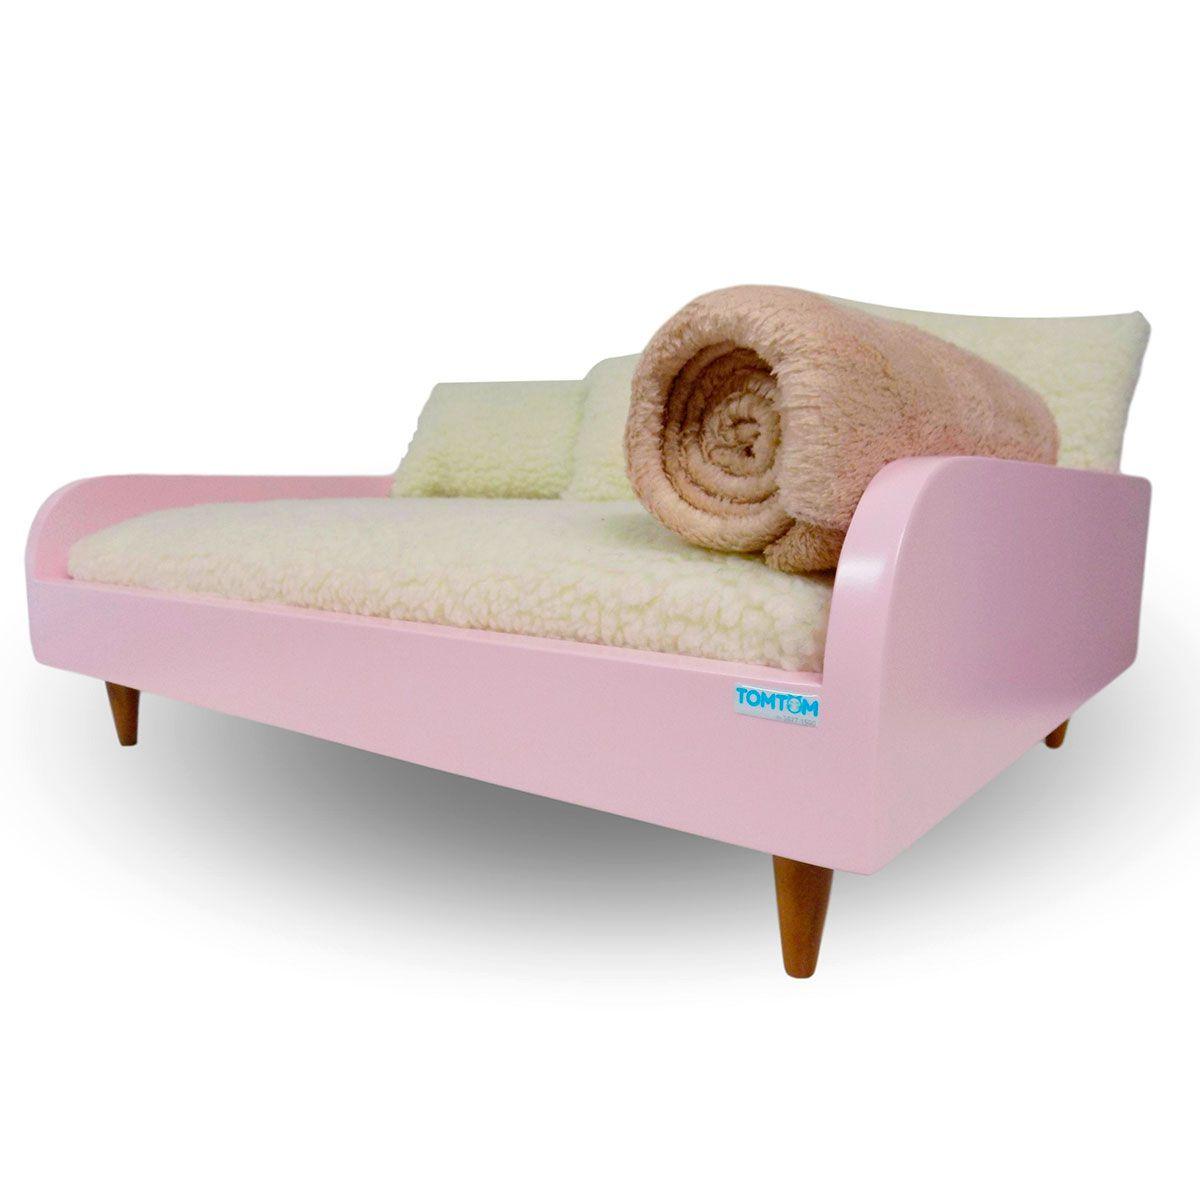 Kit Sofá Tomtom Pet Conceito Rosa Bebê